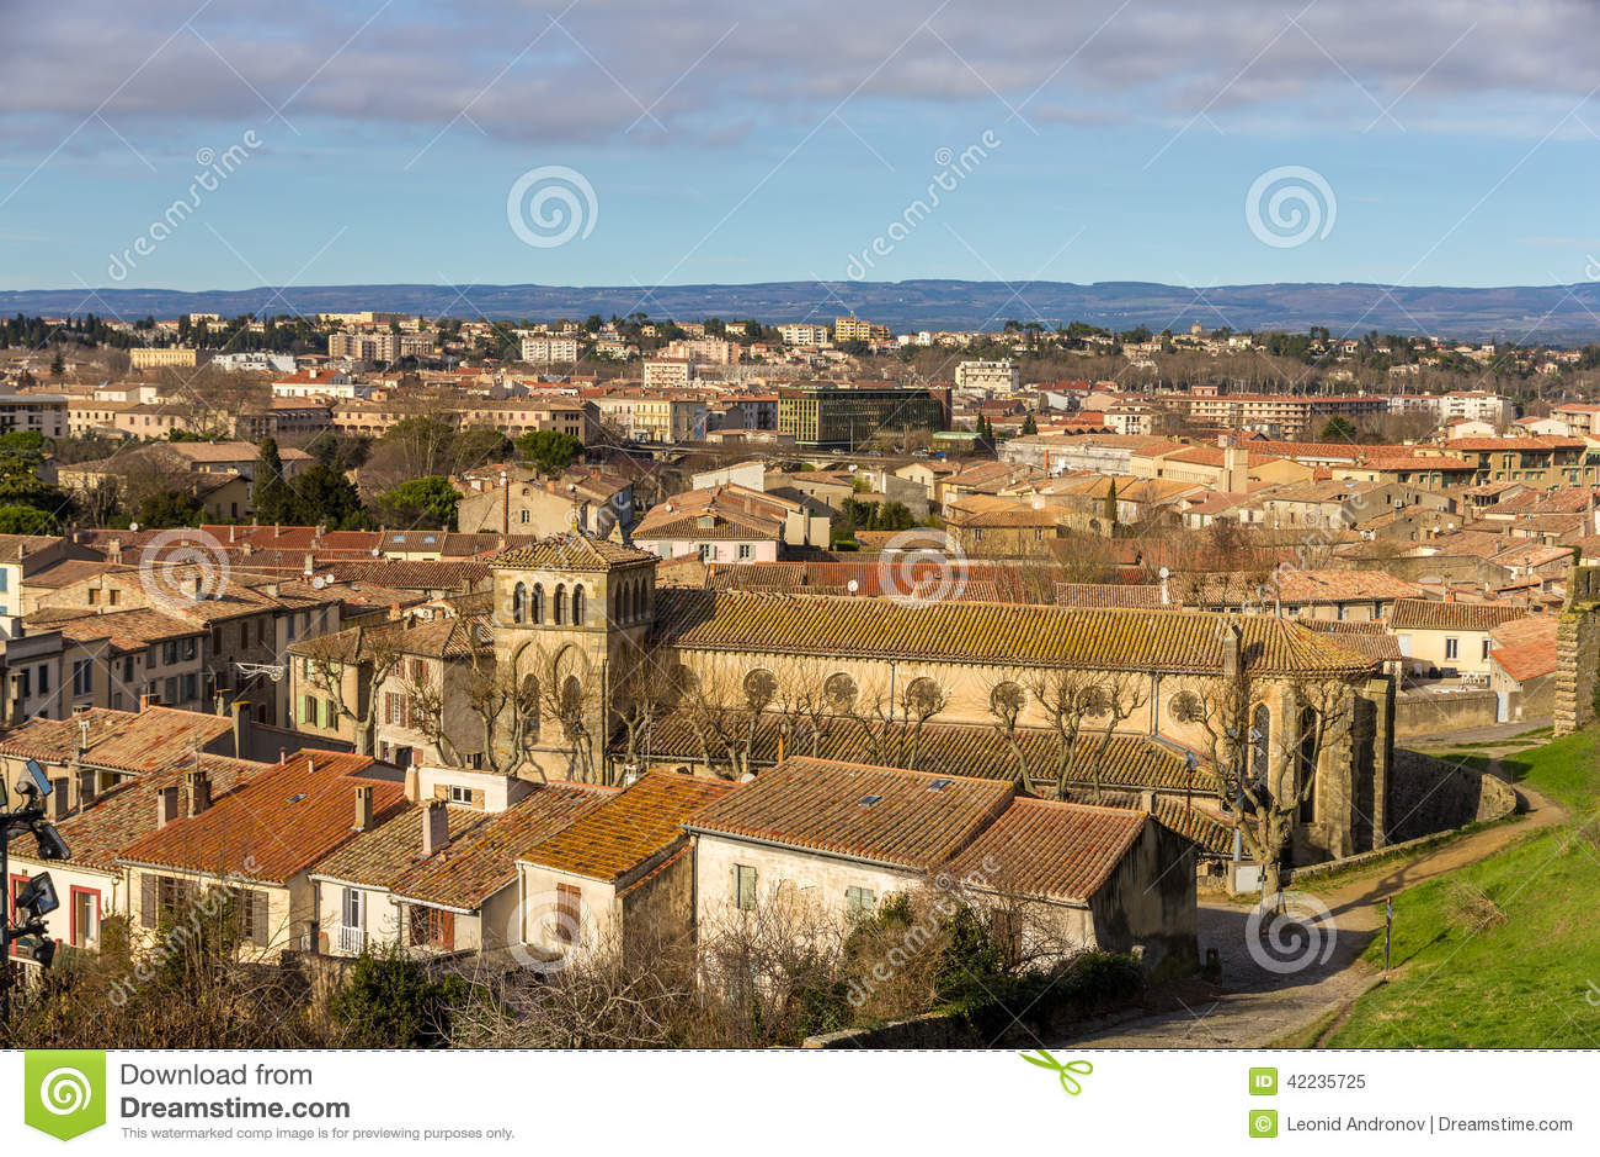 St. Gimer Church in Carcassonne, France